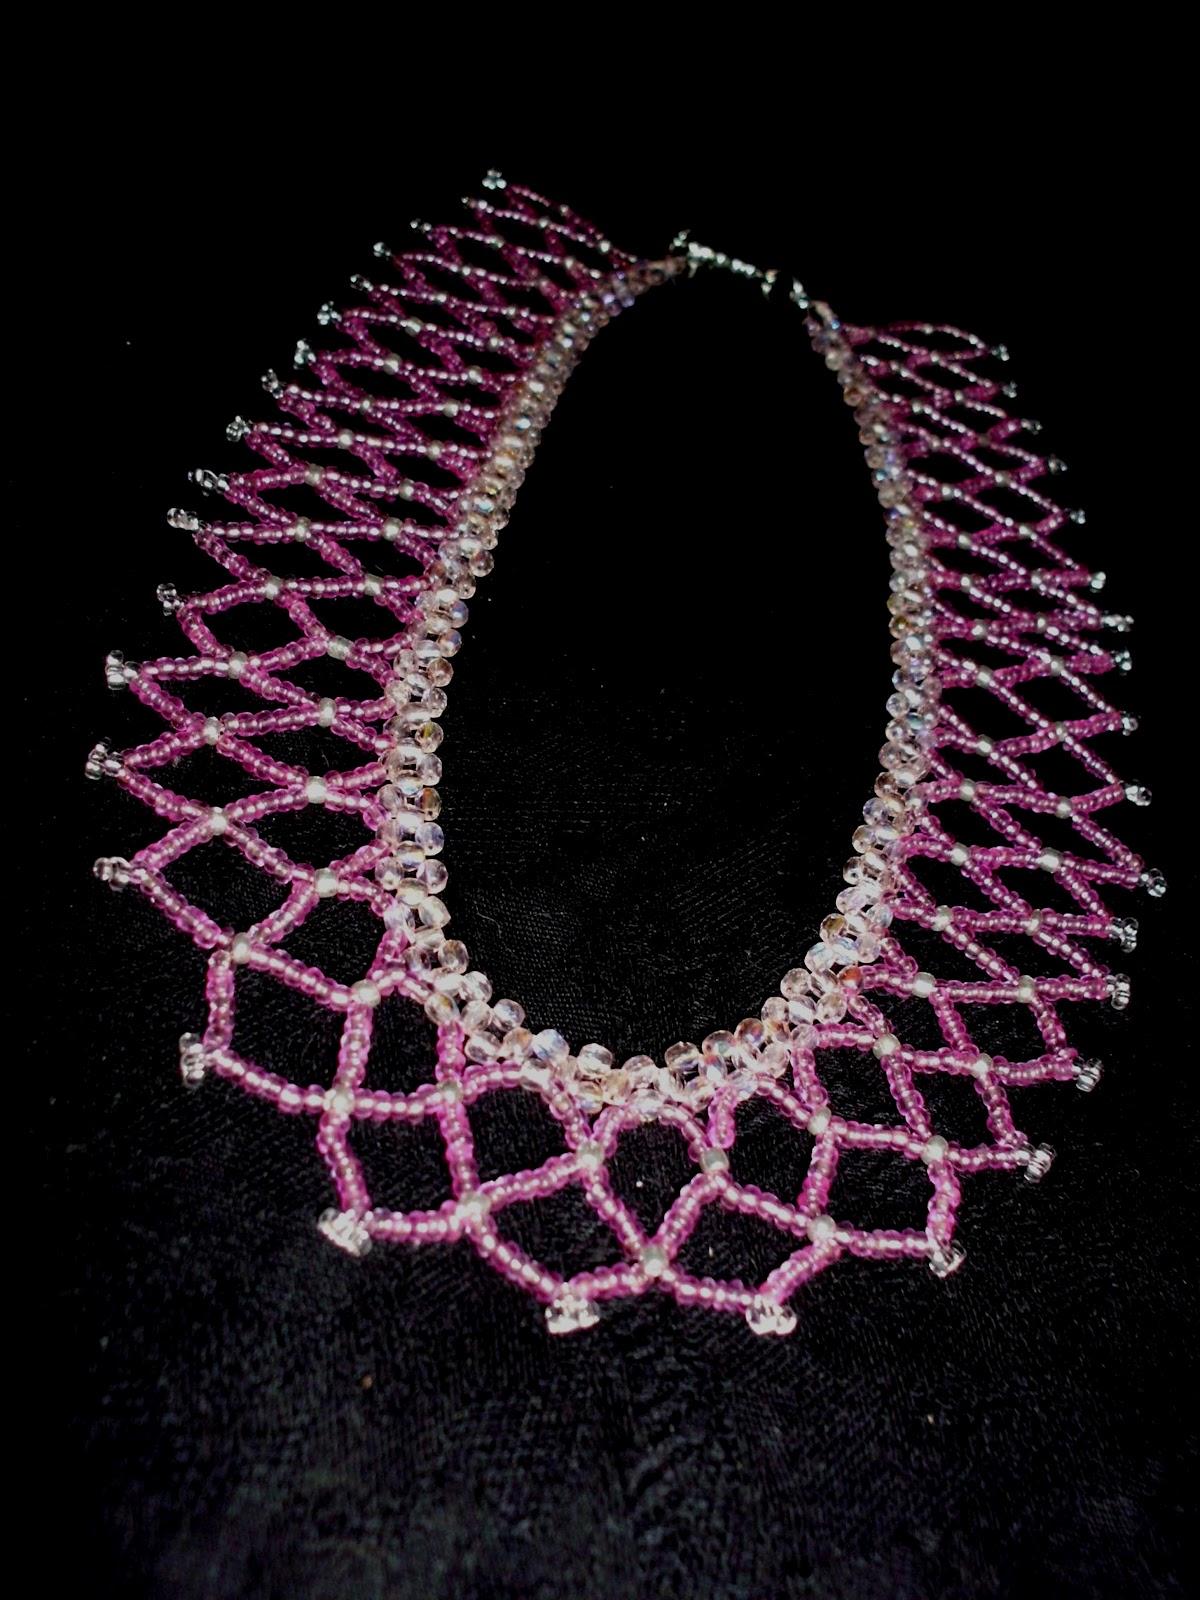 bead weaving kits and classes bead weaving kits and classes